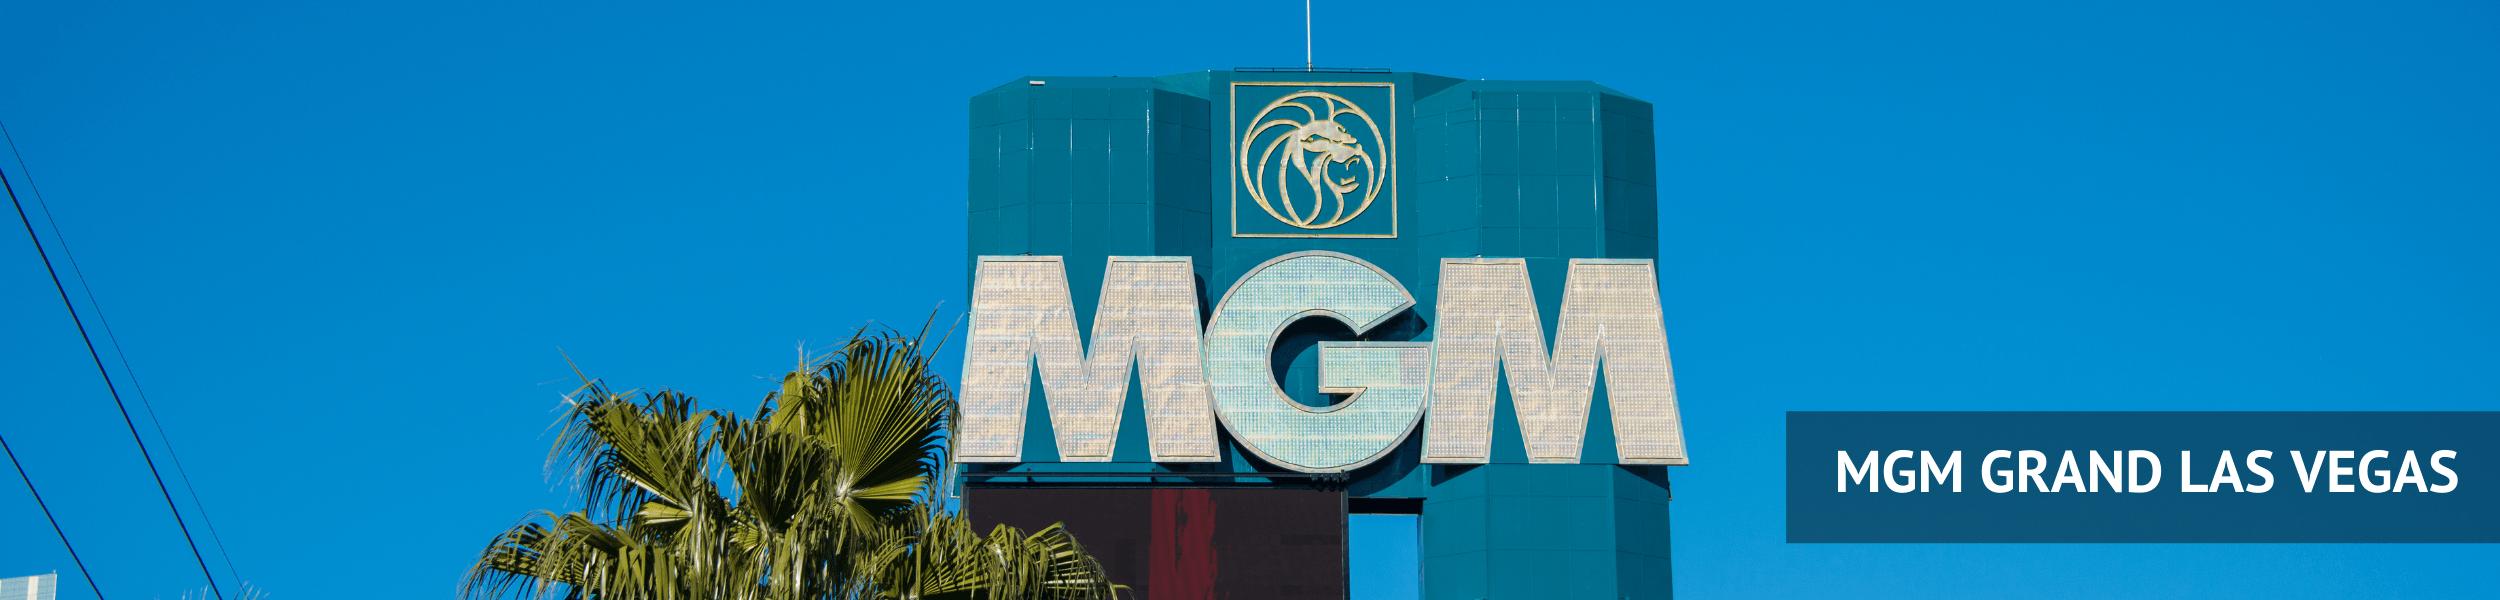 MGM Grand Header